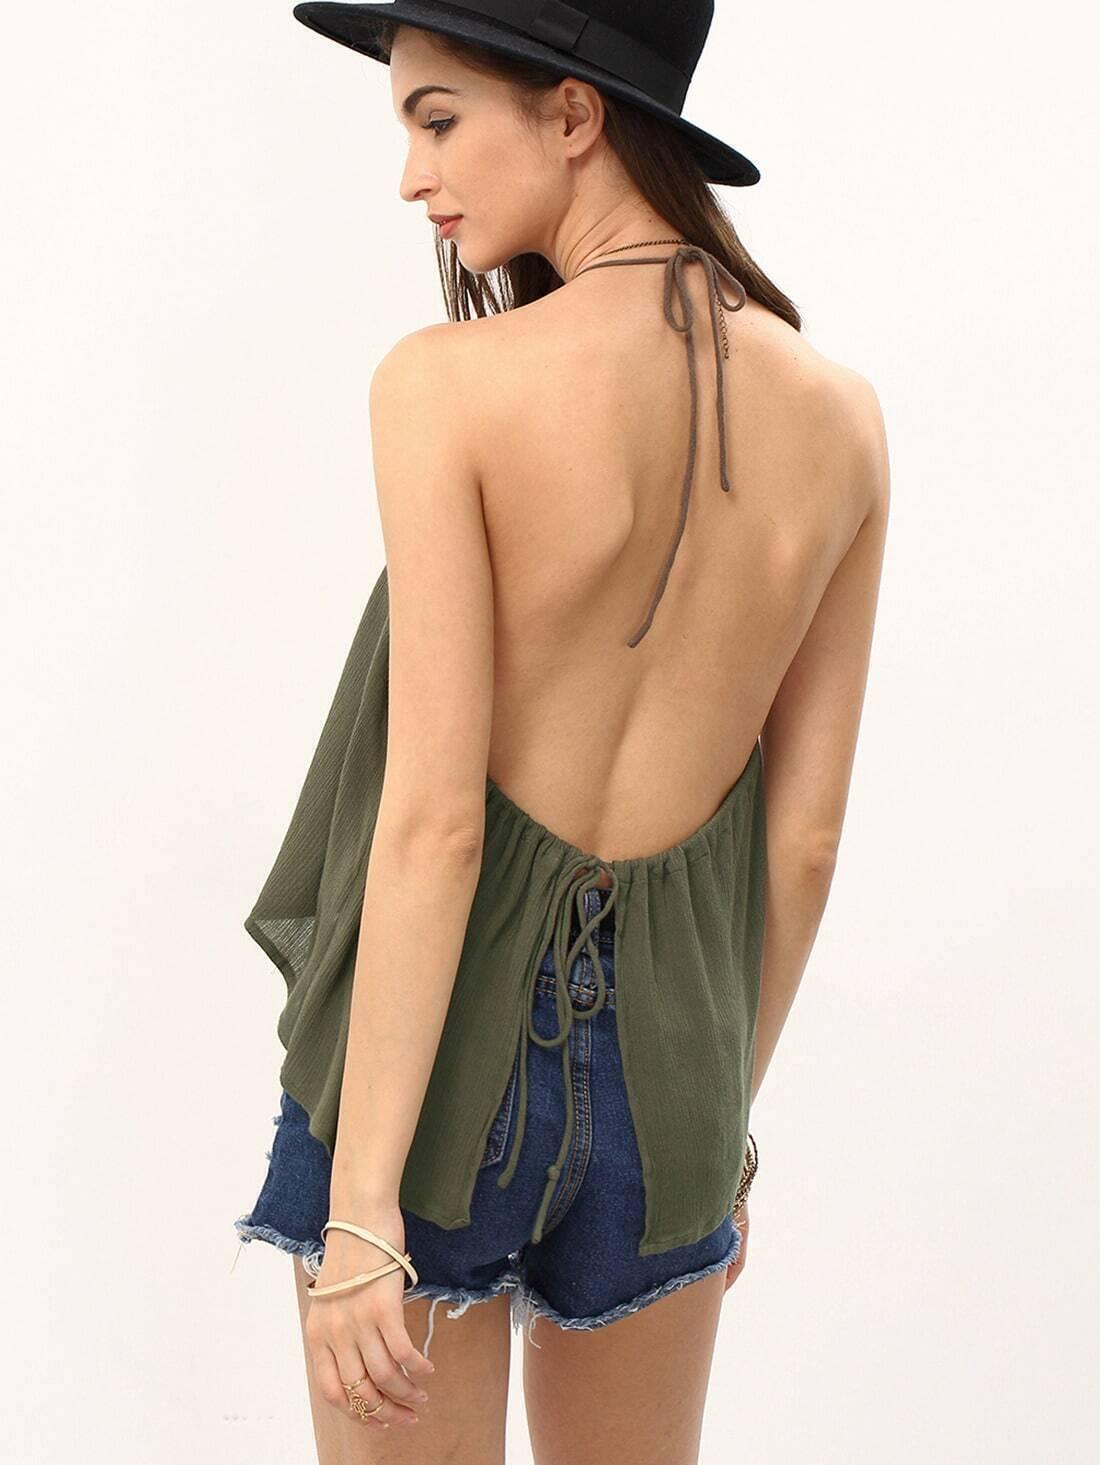 7c0e4ef7823f30 Army Green Halter Neck Tube Crop Top EmmaCloth-Women Fast Fashion Online